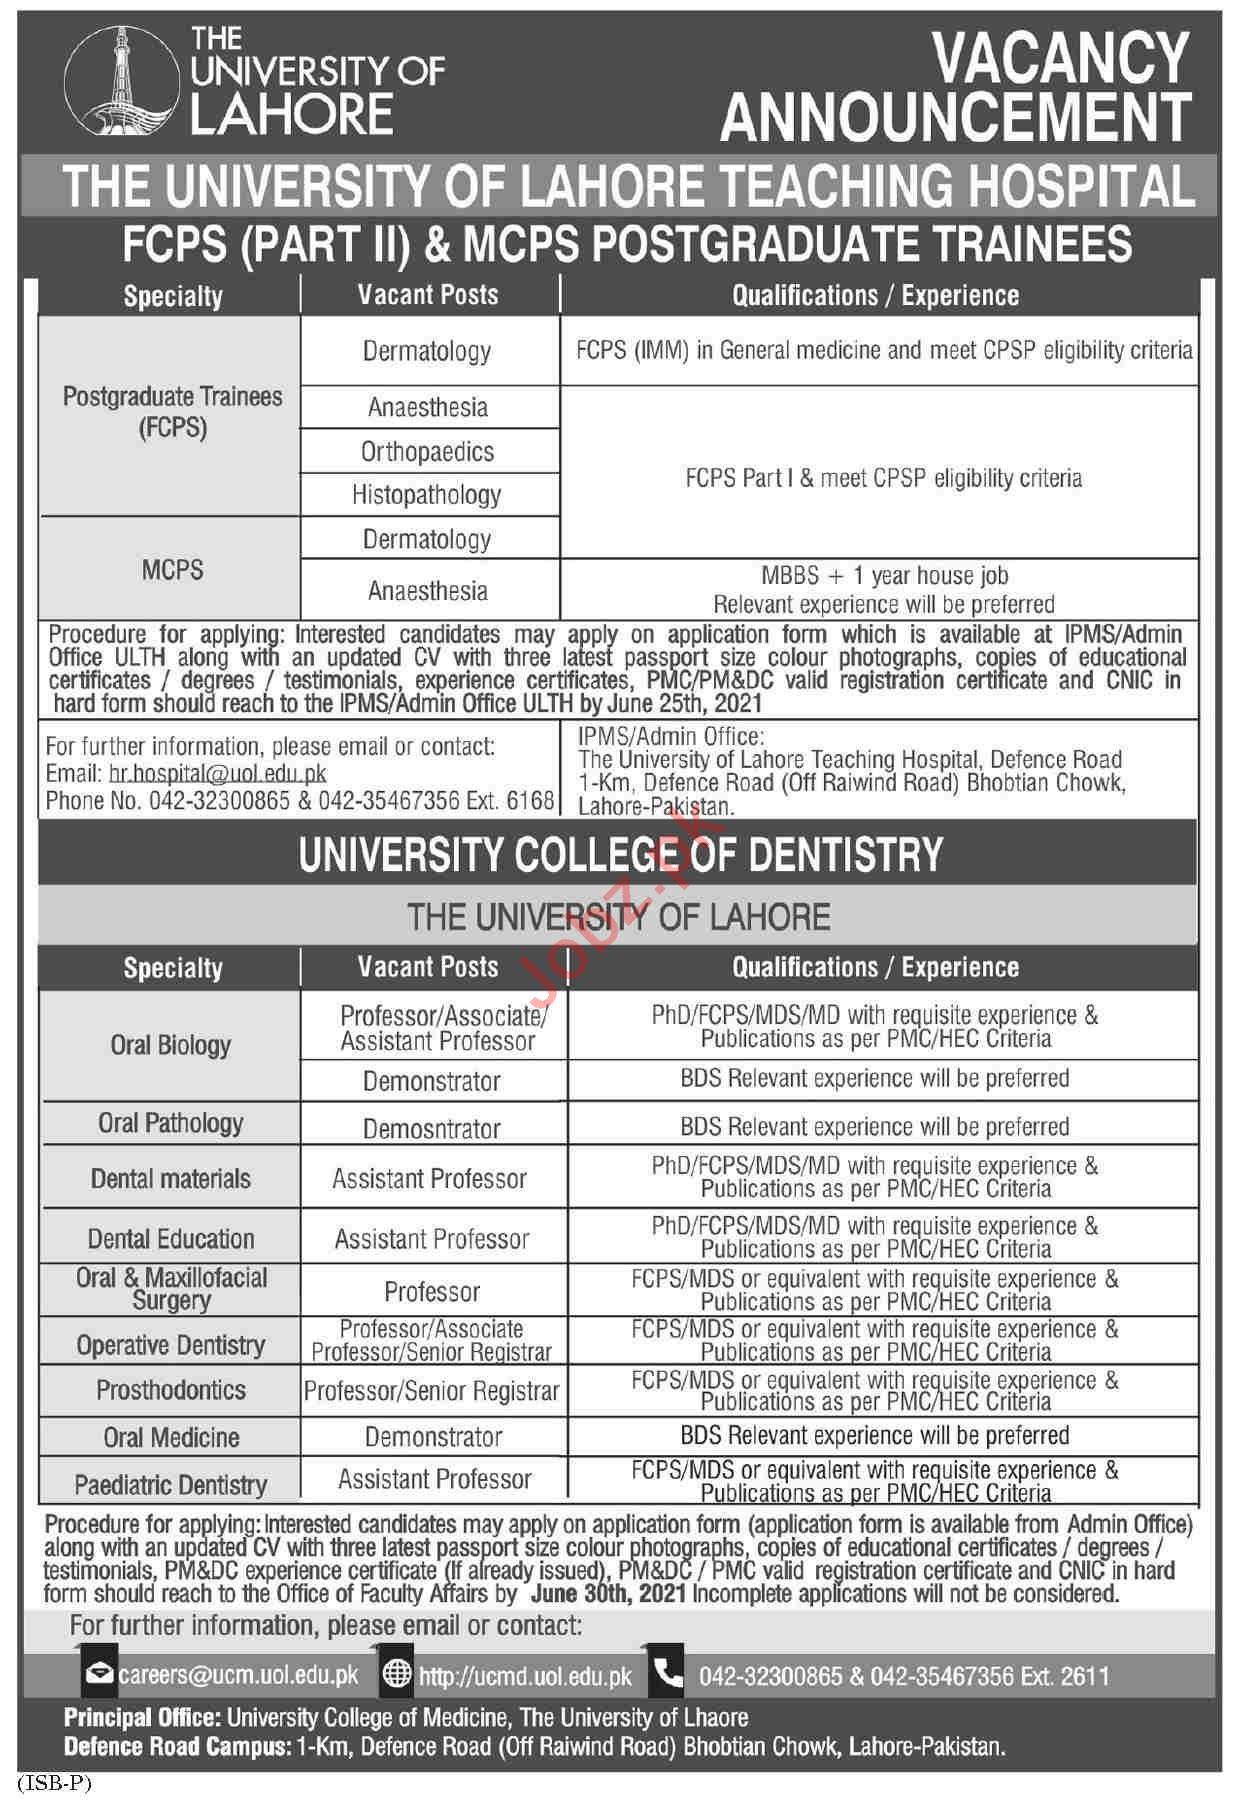 The University of Lahore Teaching Hospital Jobs 2021